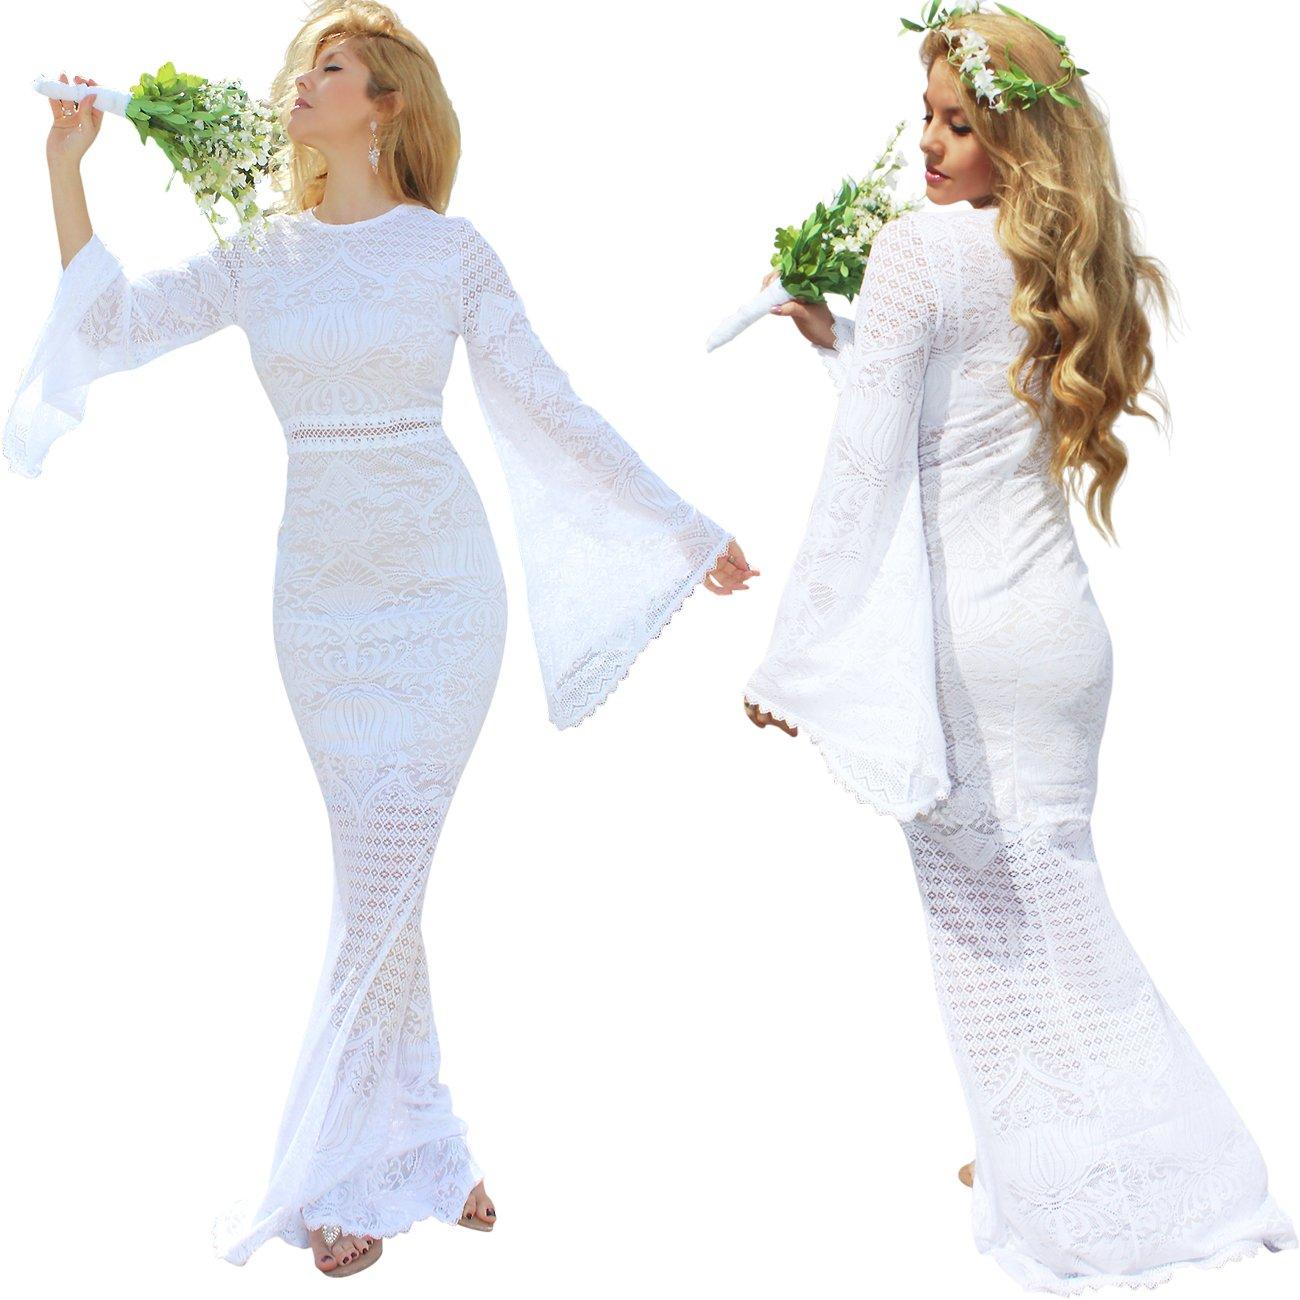 Boho Gypsy Wedding Dress Vintage Angel Bell Sleeve Goddess Bridal Dress Usa Made Casual Beach Wedding Dress